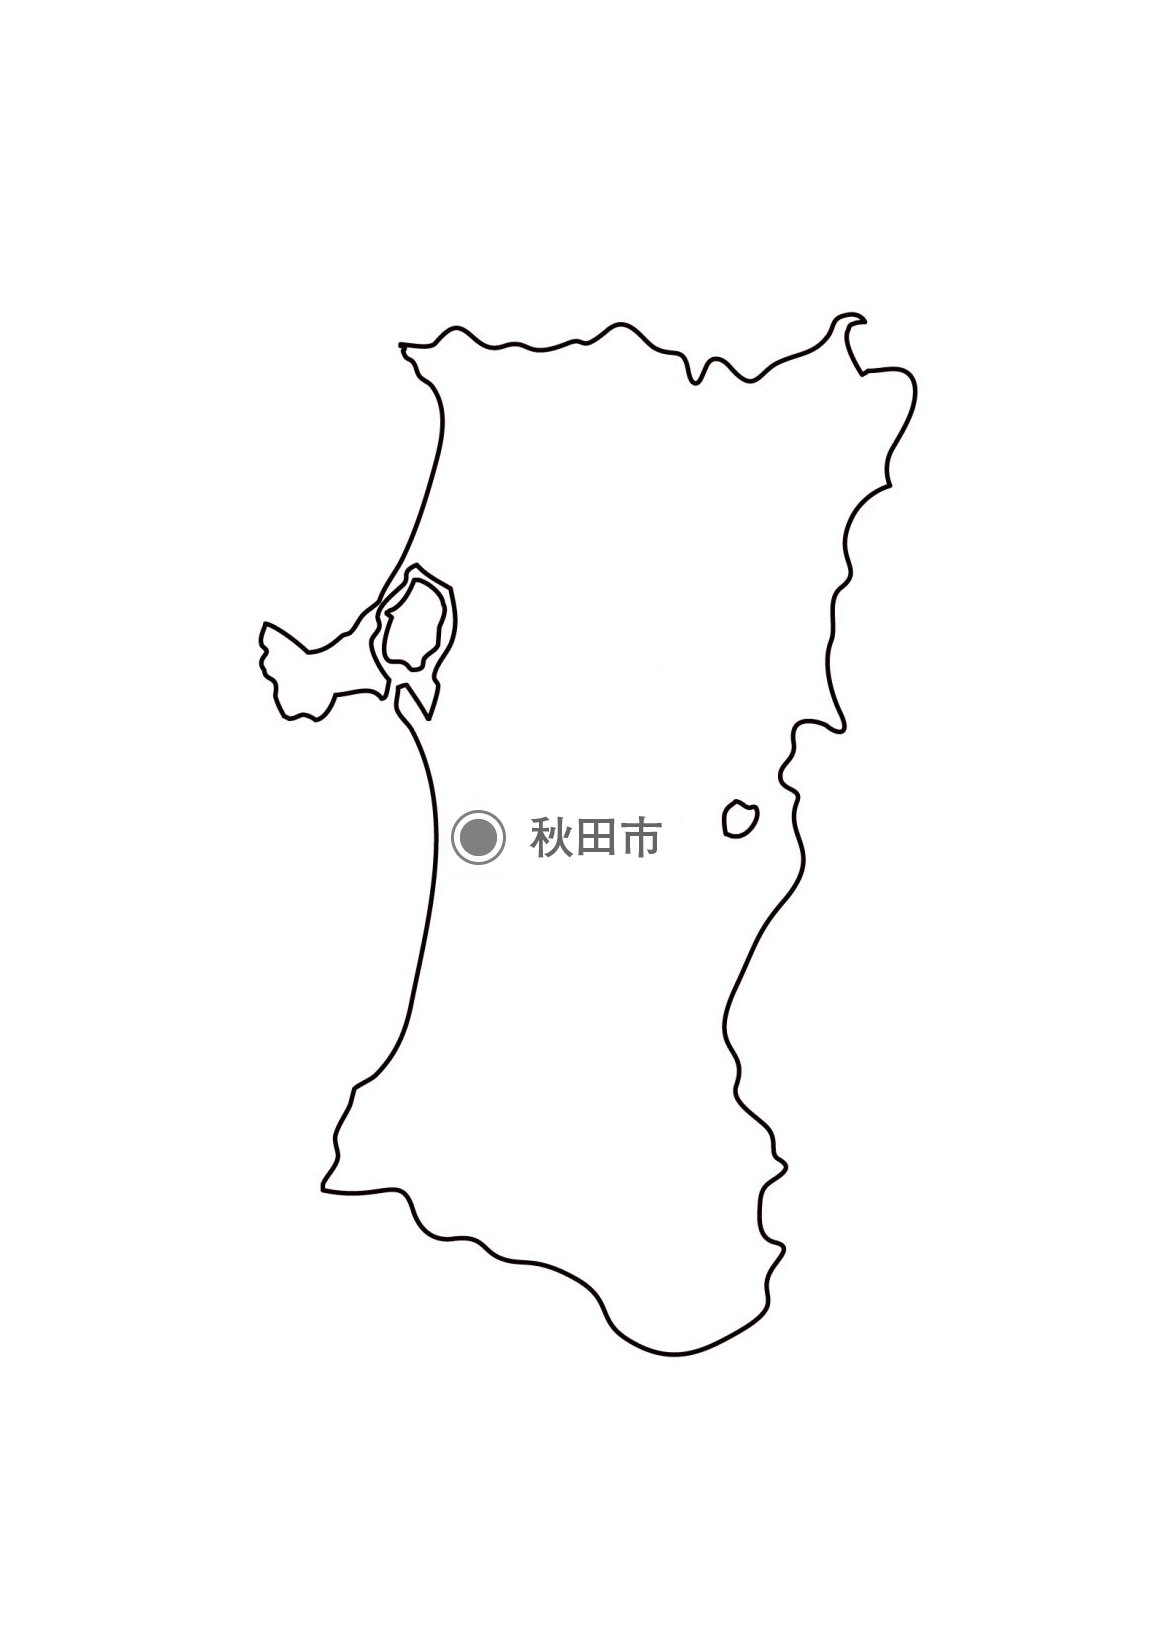 [白地図]秋田県・都道府県名・県庁所在地あり